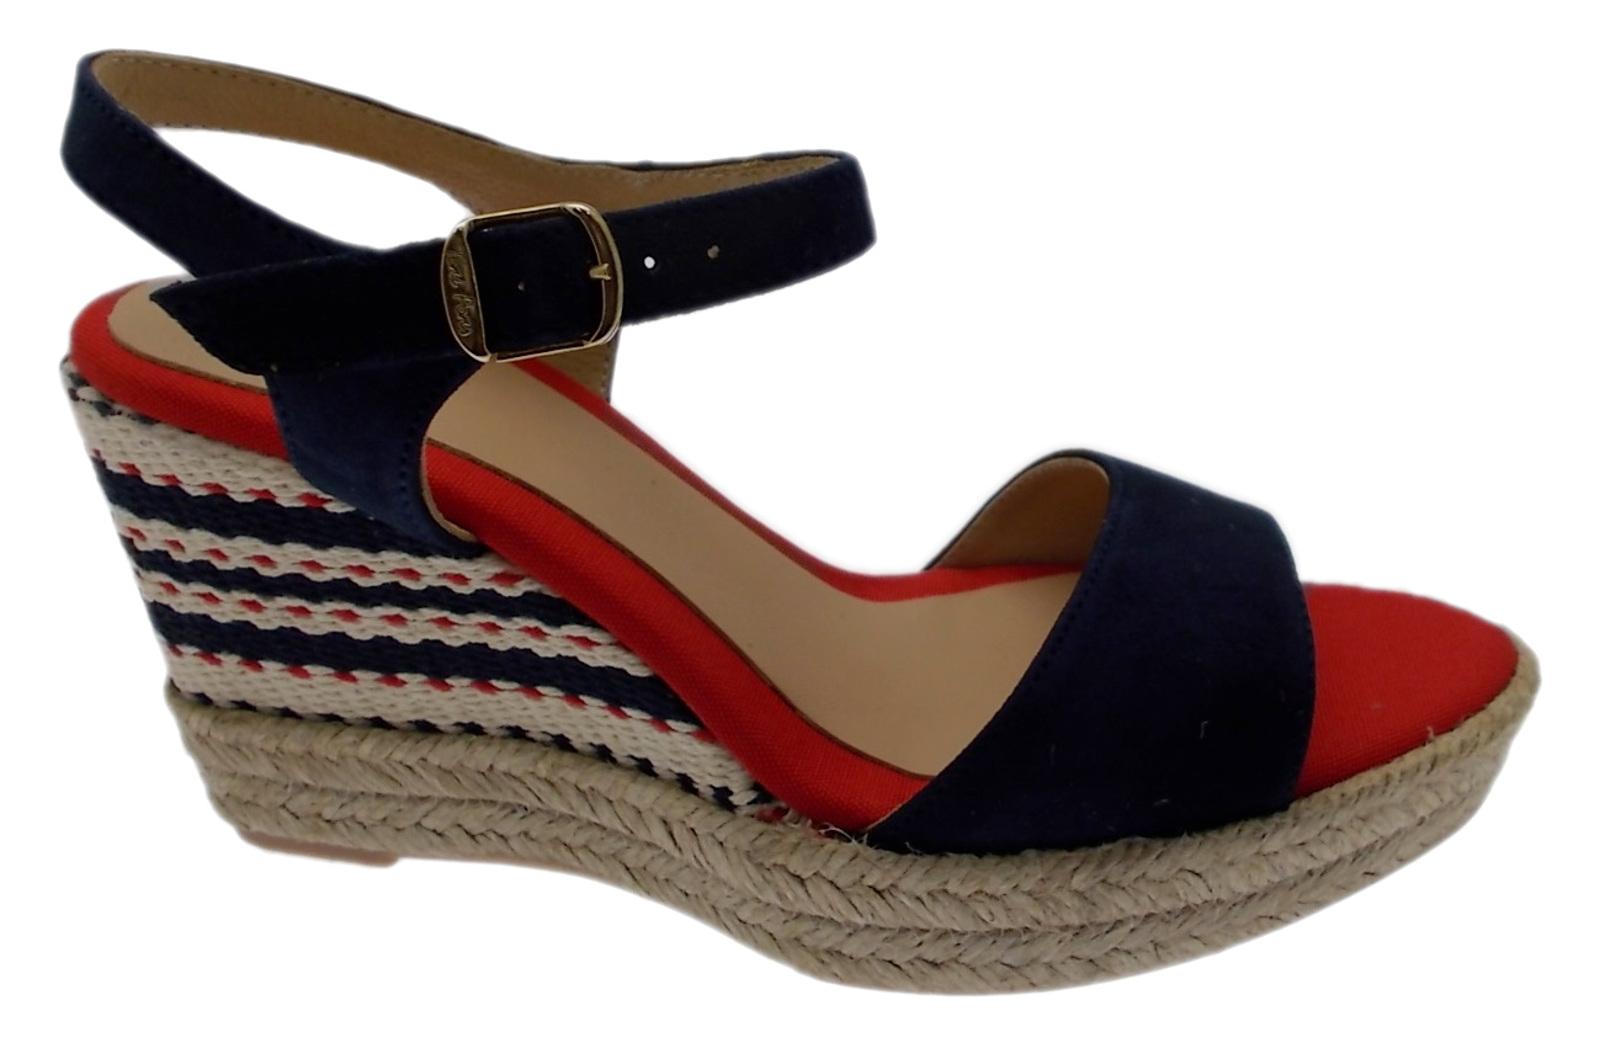 ALEXIA sandalo  corda multicolor  blue bianco red zeppa espadrillas Toni Pons